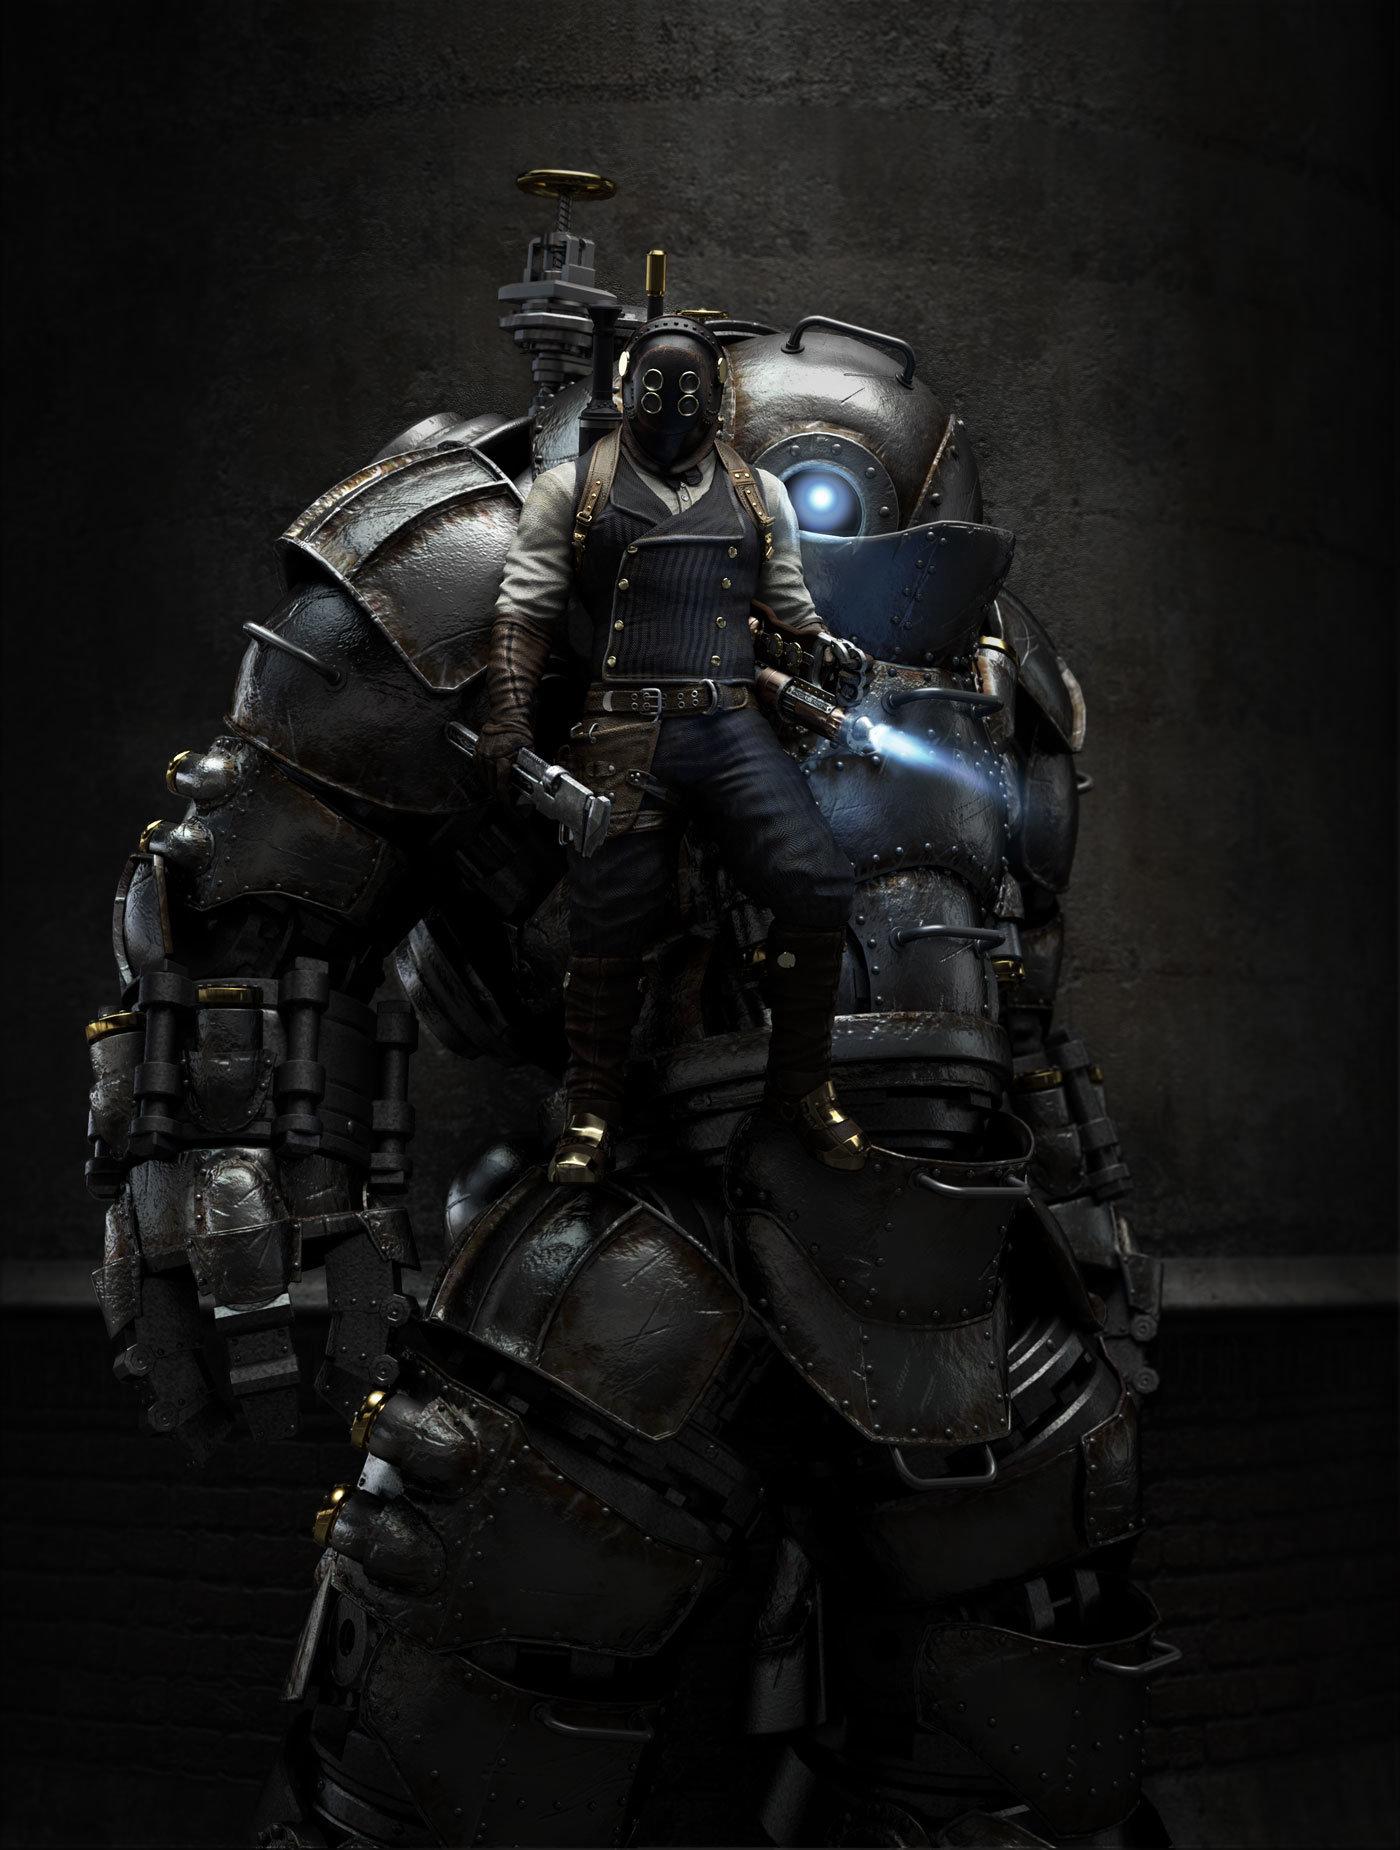 aldo-vicente-avcg-machinistguardian-001